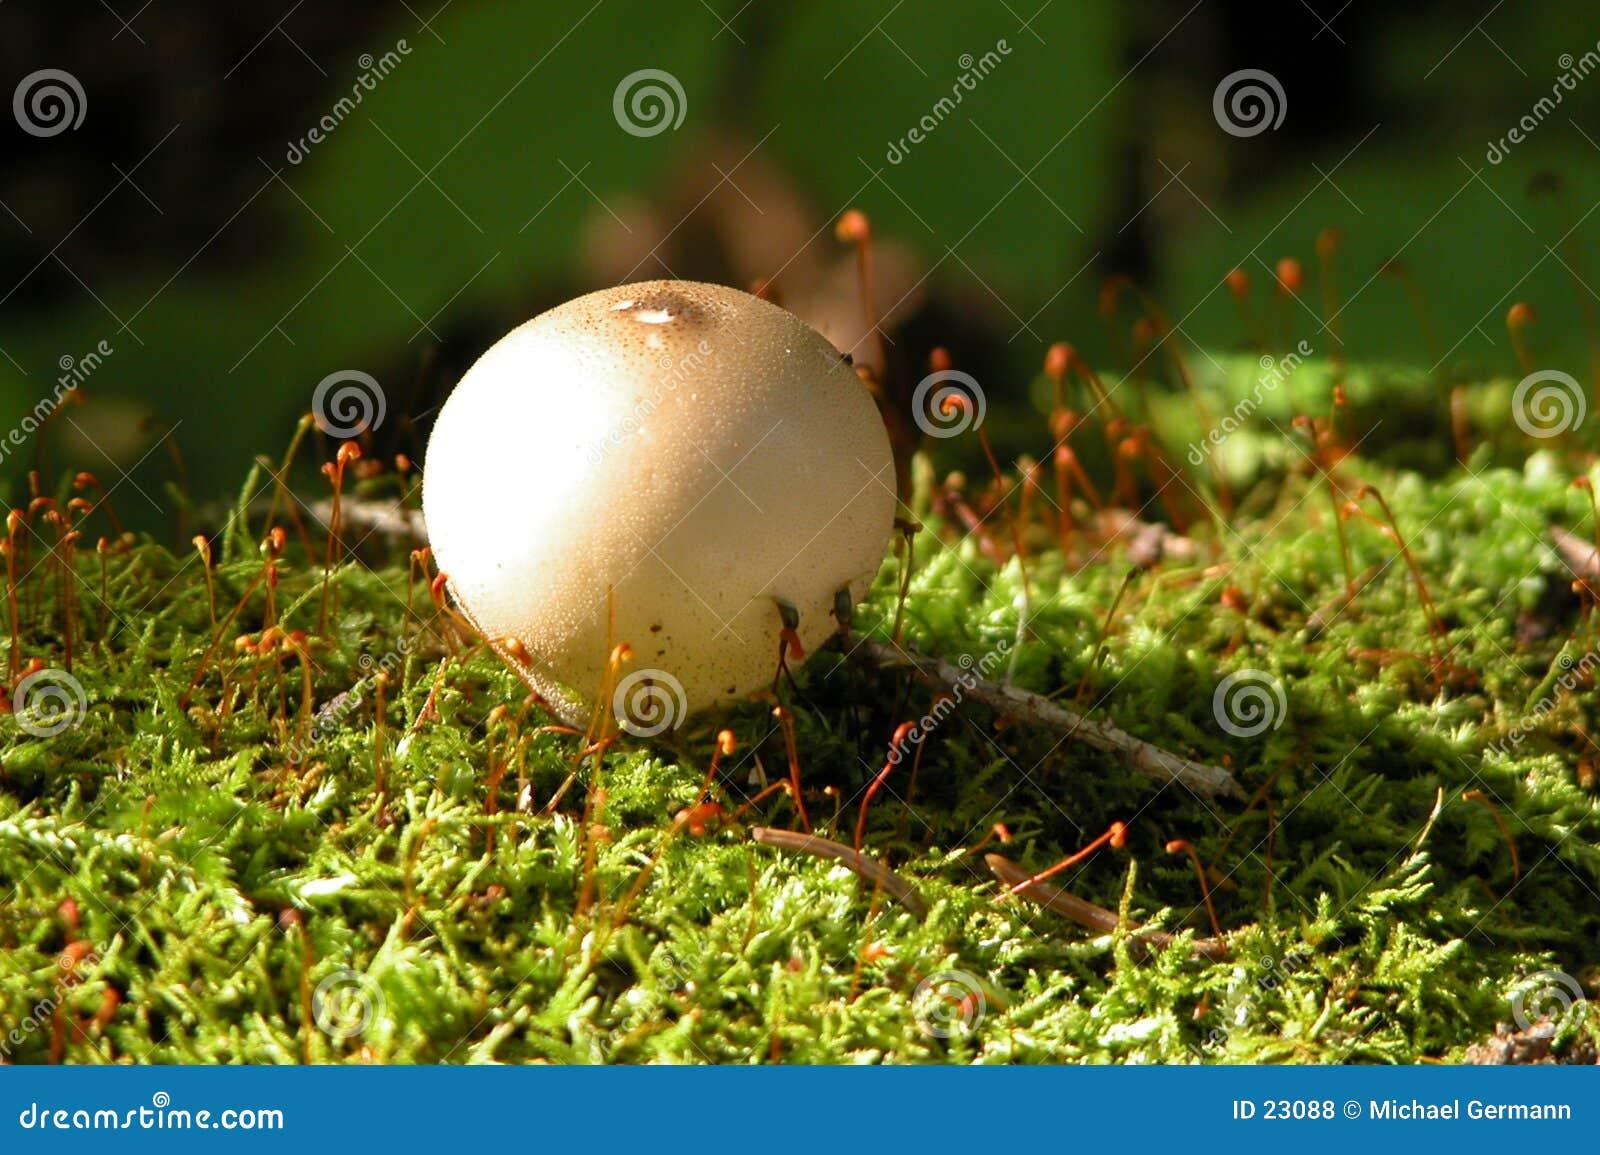 Moss grzybek